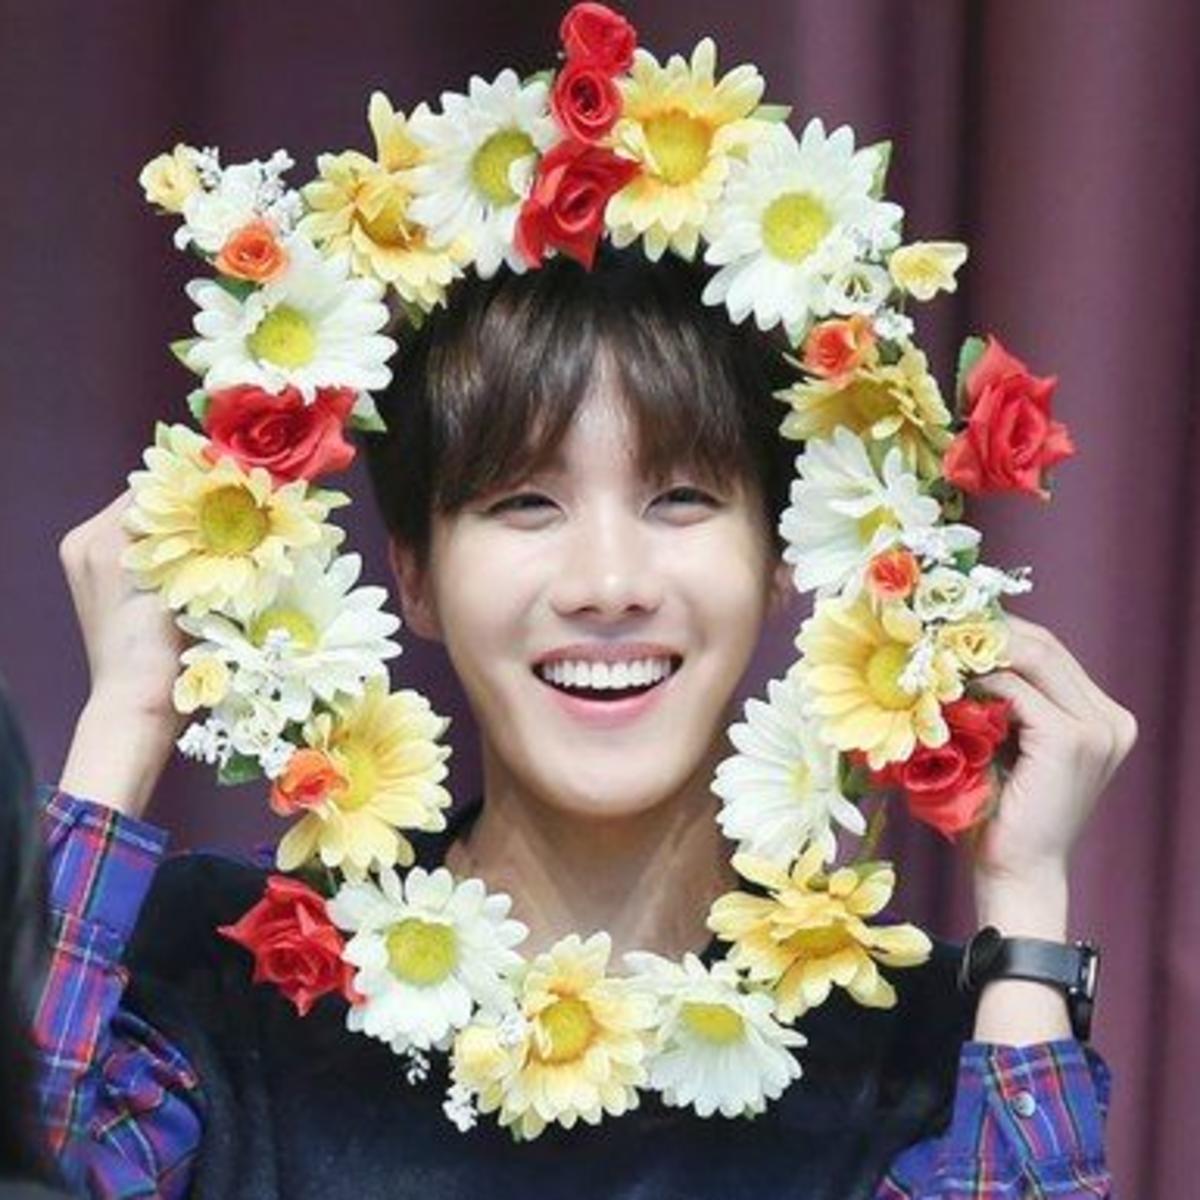 10-reasons-why-everybody-loves-bts-j-hope-jung-hoseok